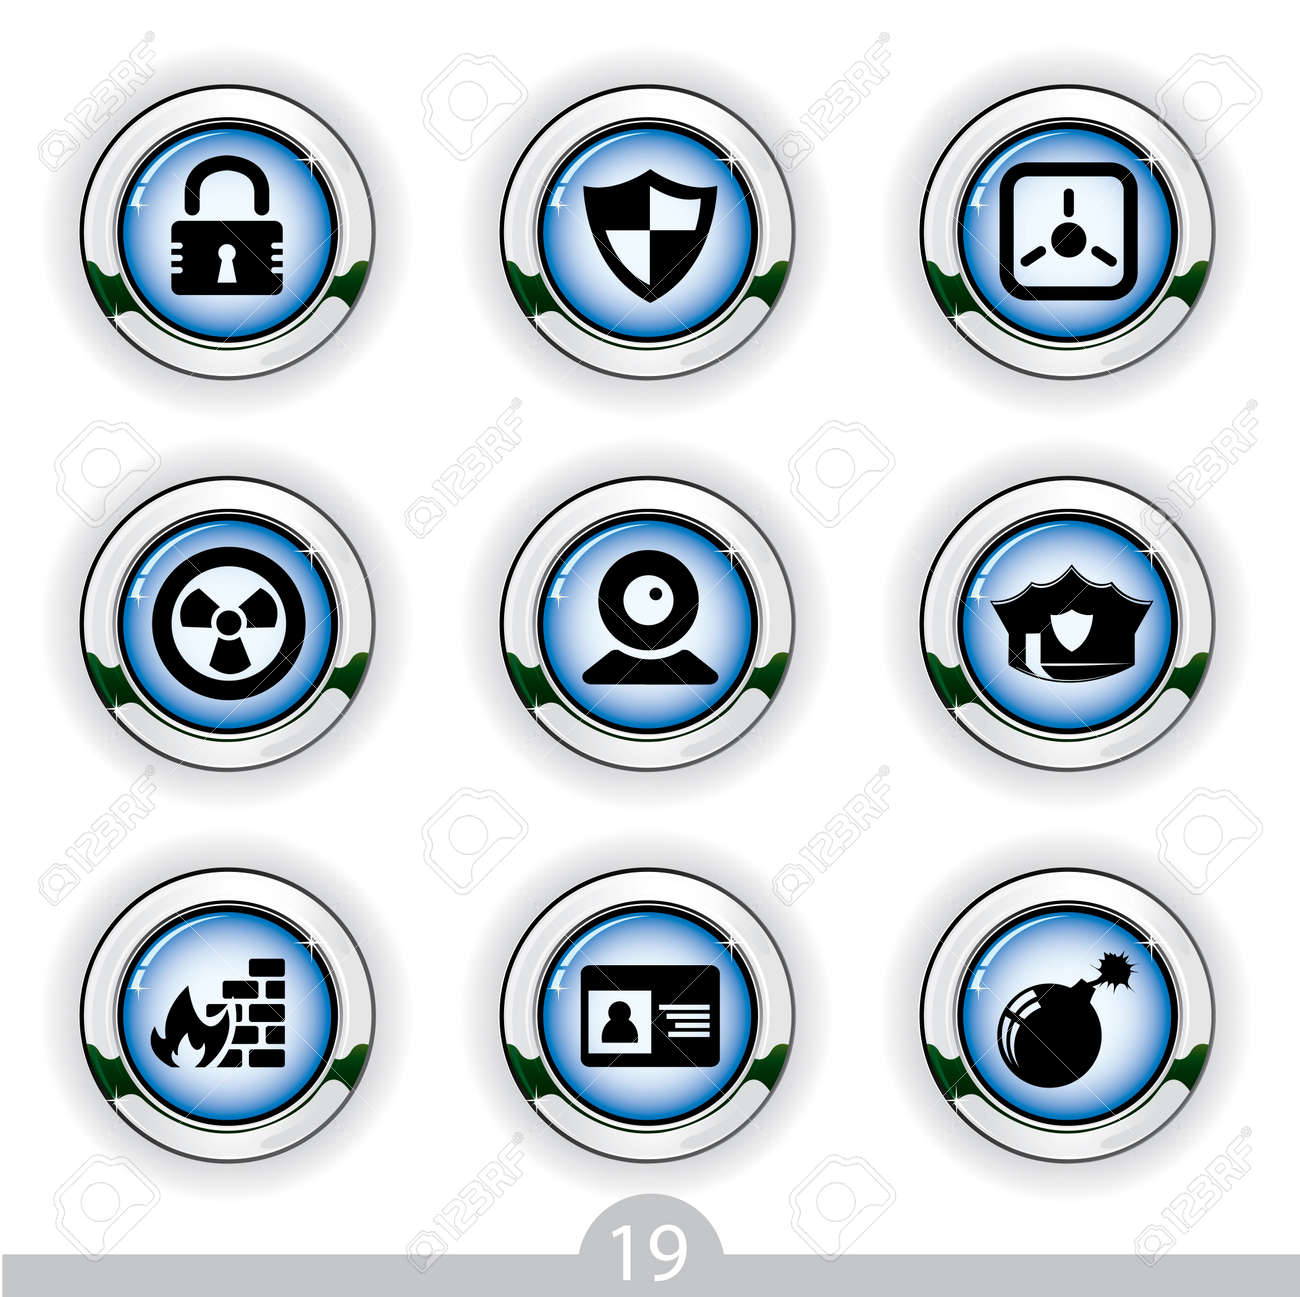 Securtiy icons series no.19 Stock Vector - 7000986